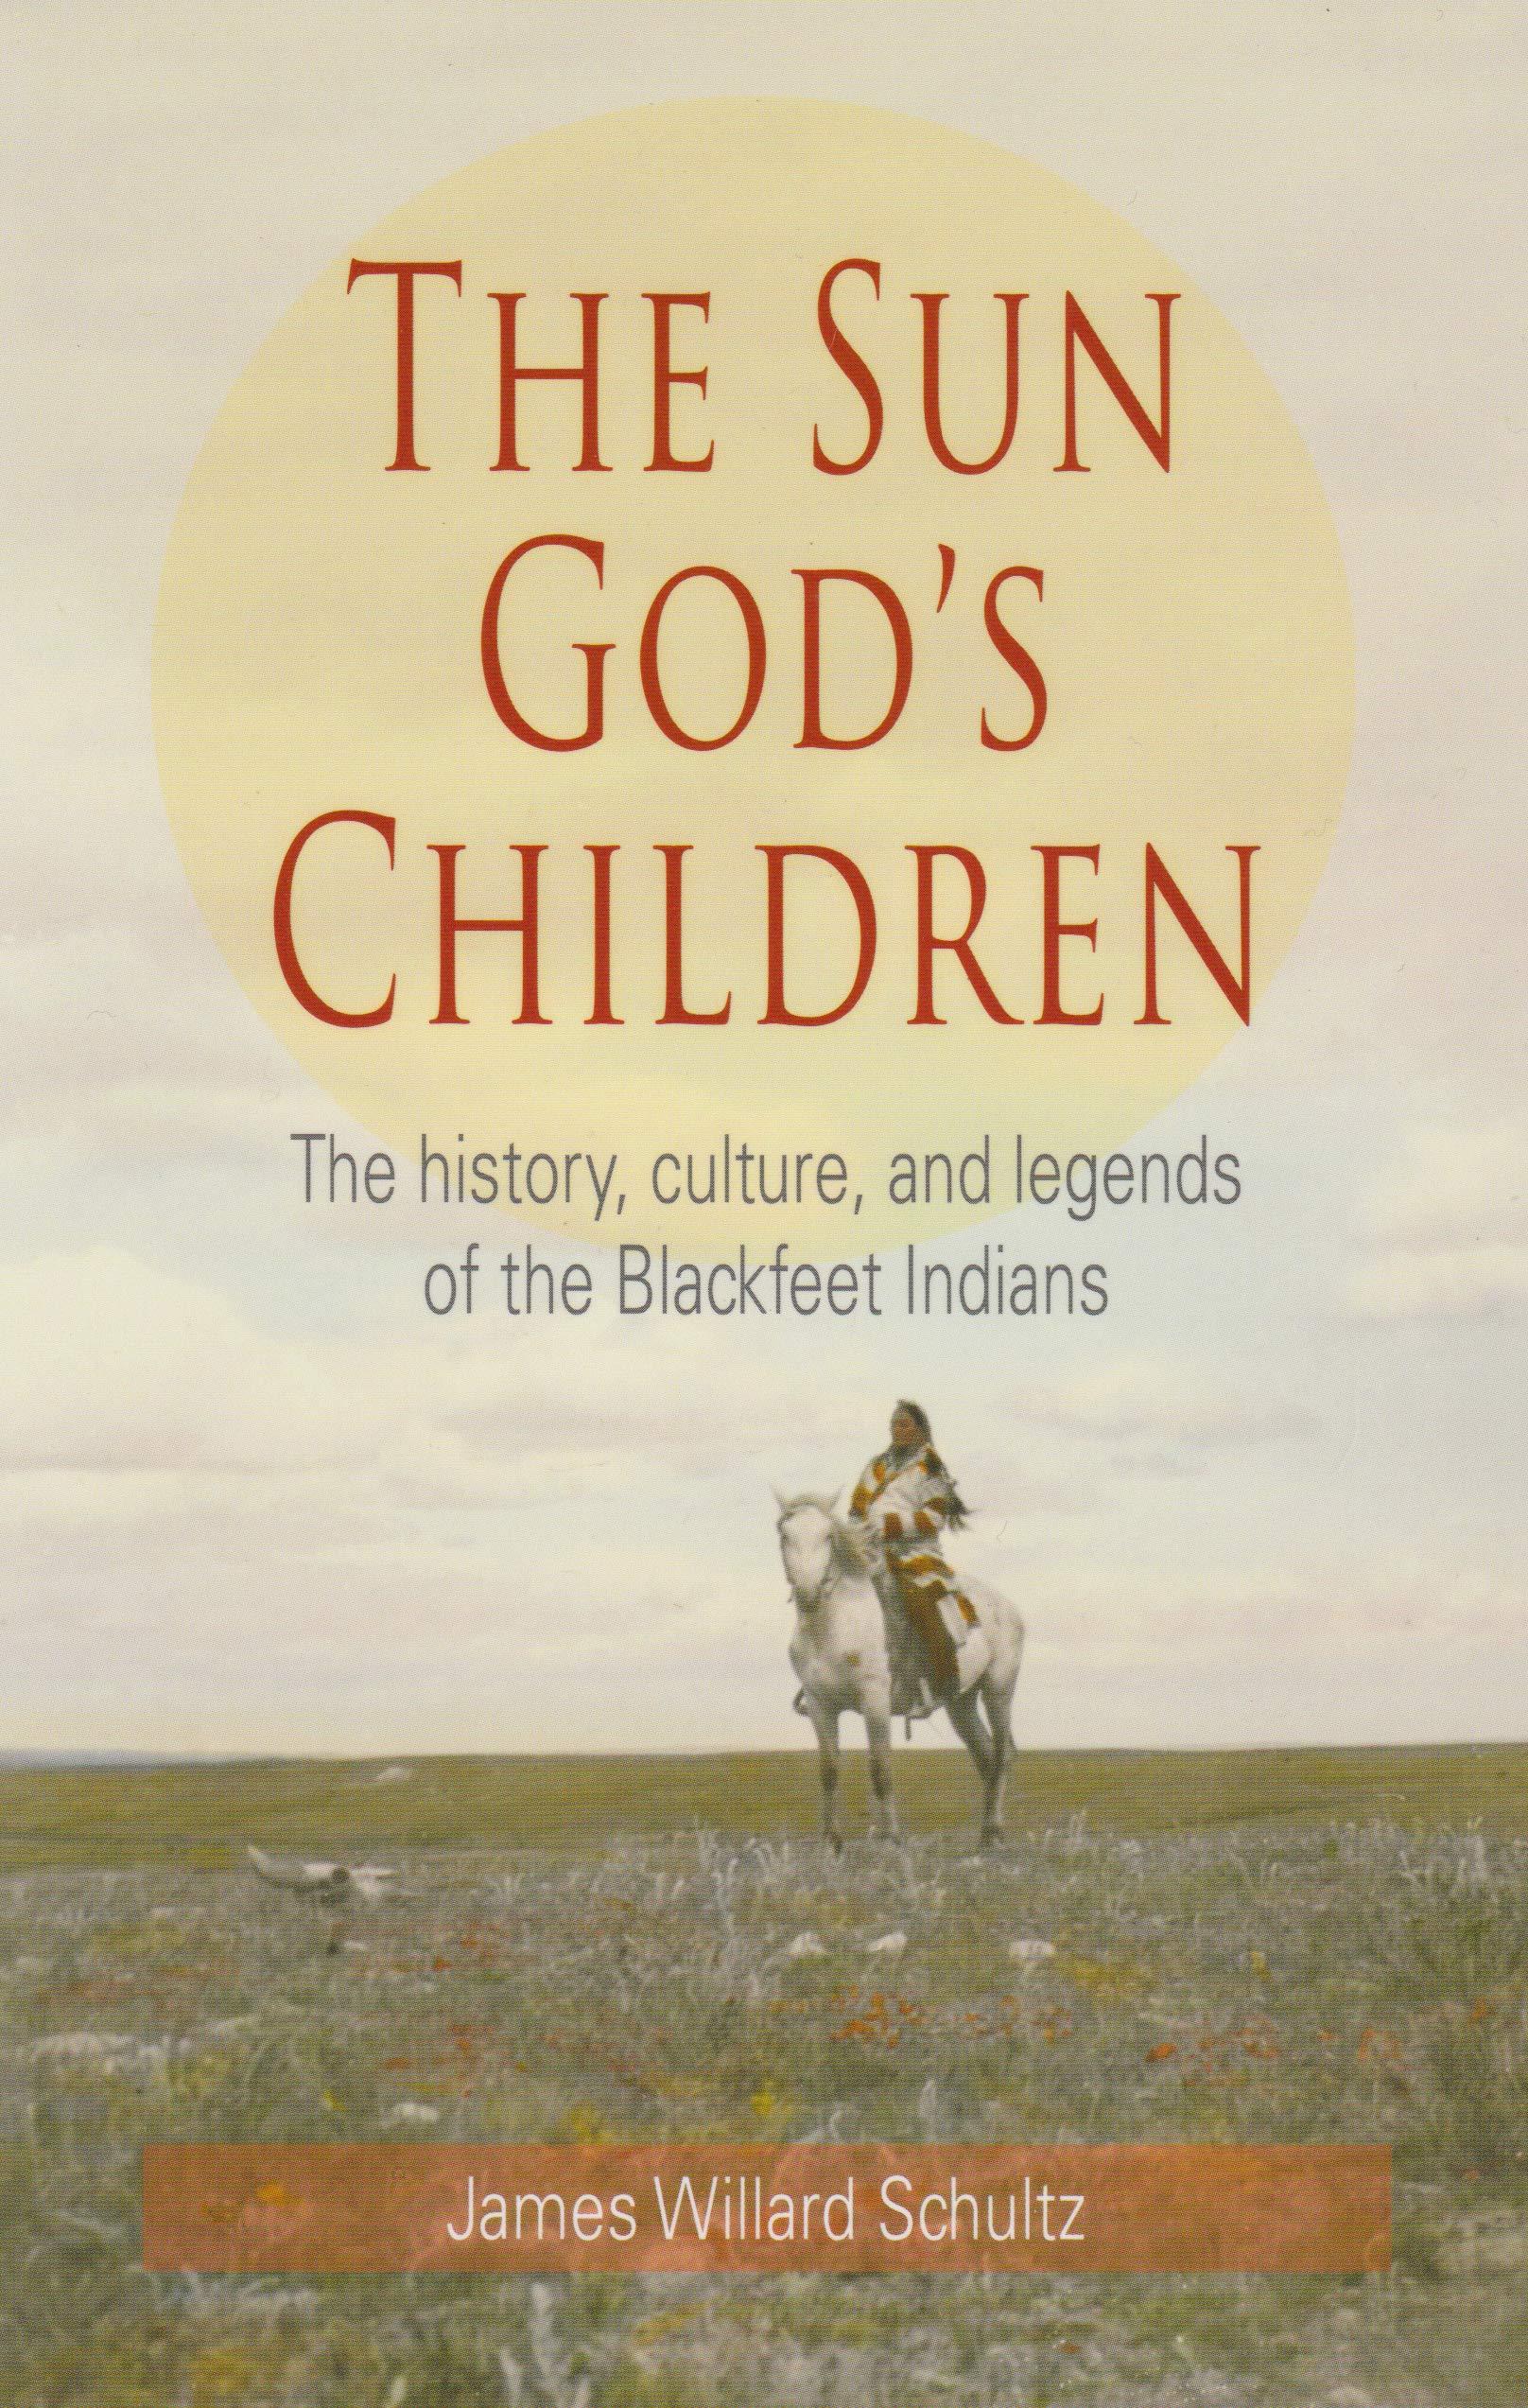 The Sun God's Children: The History of the Blackfeet Indians ebook